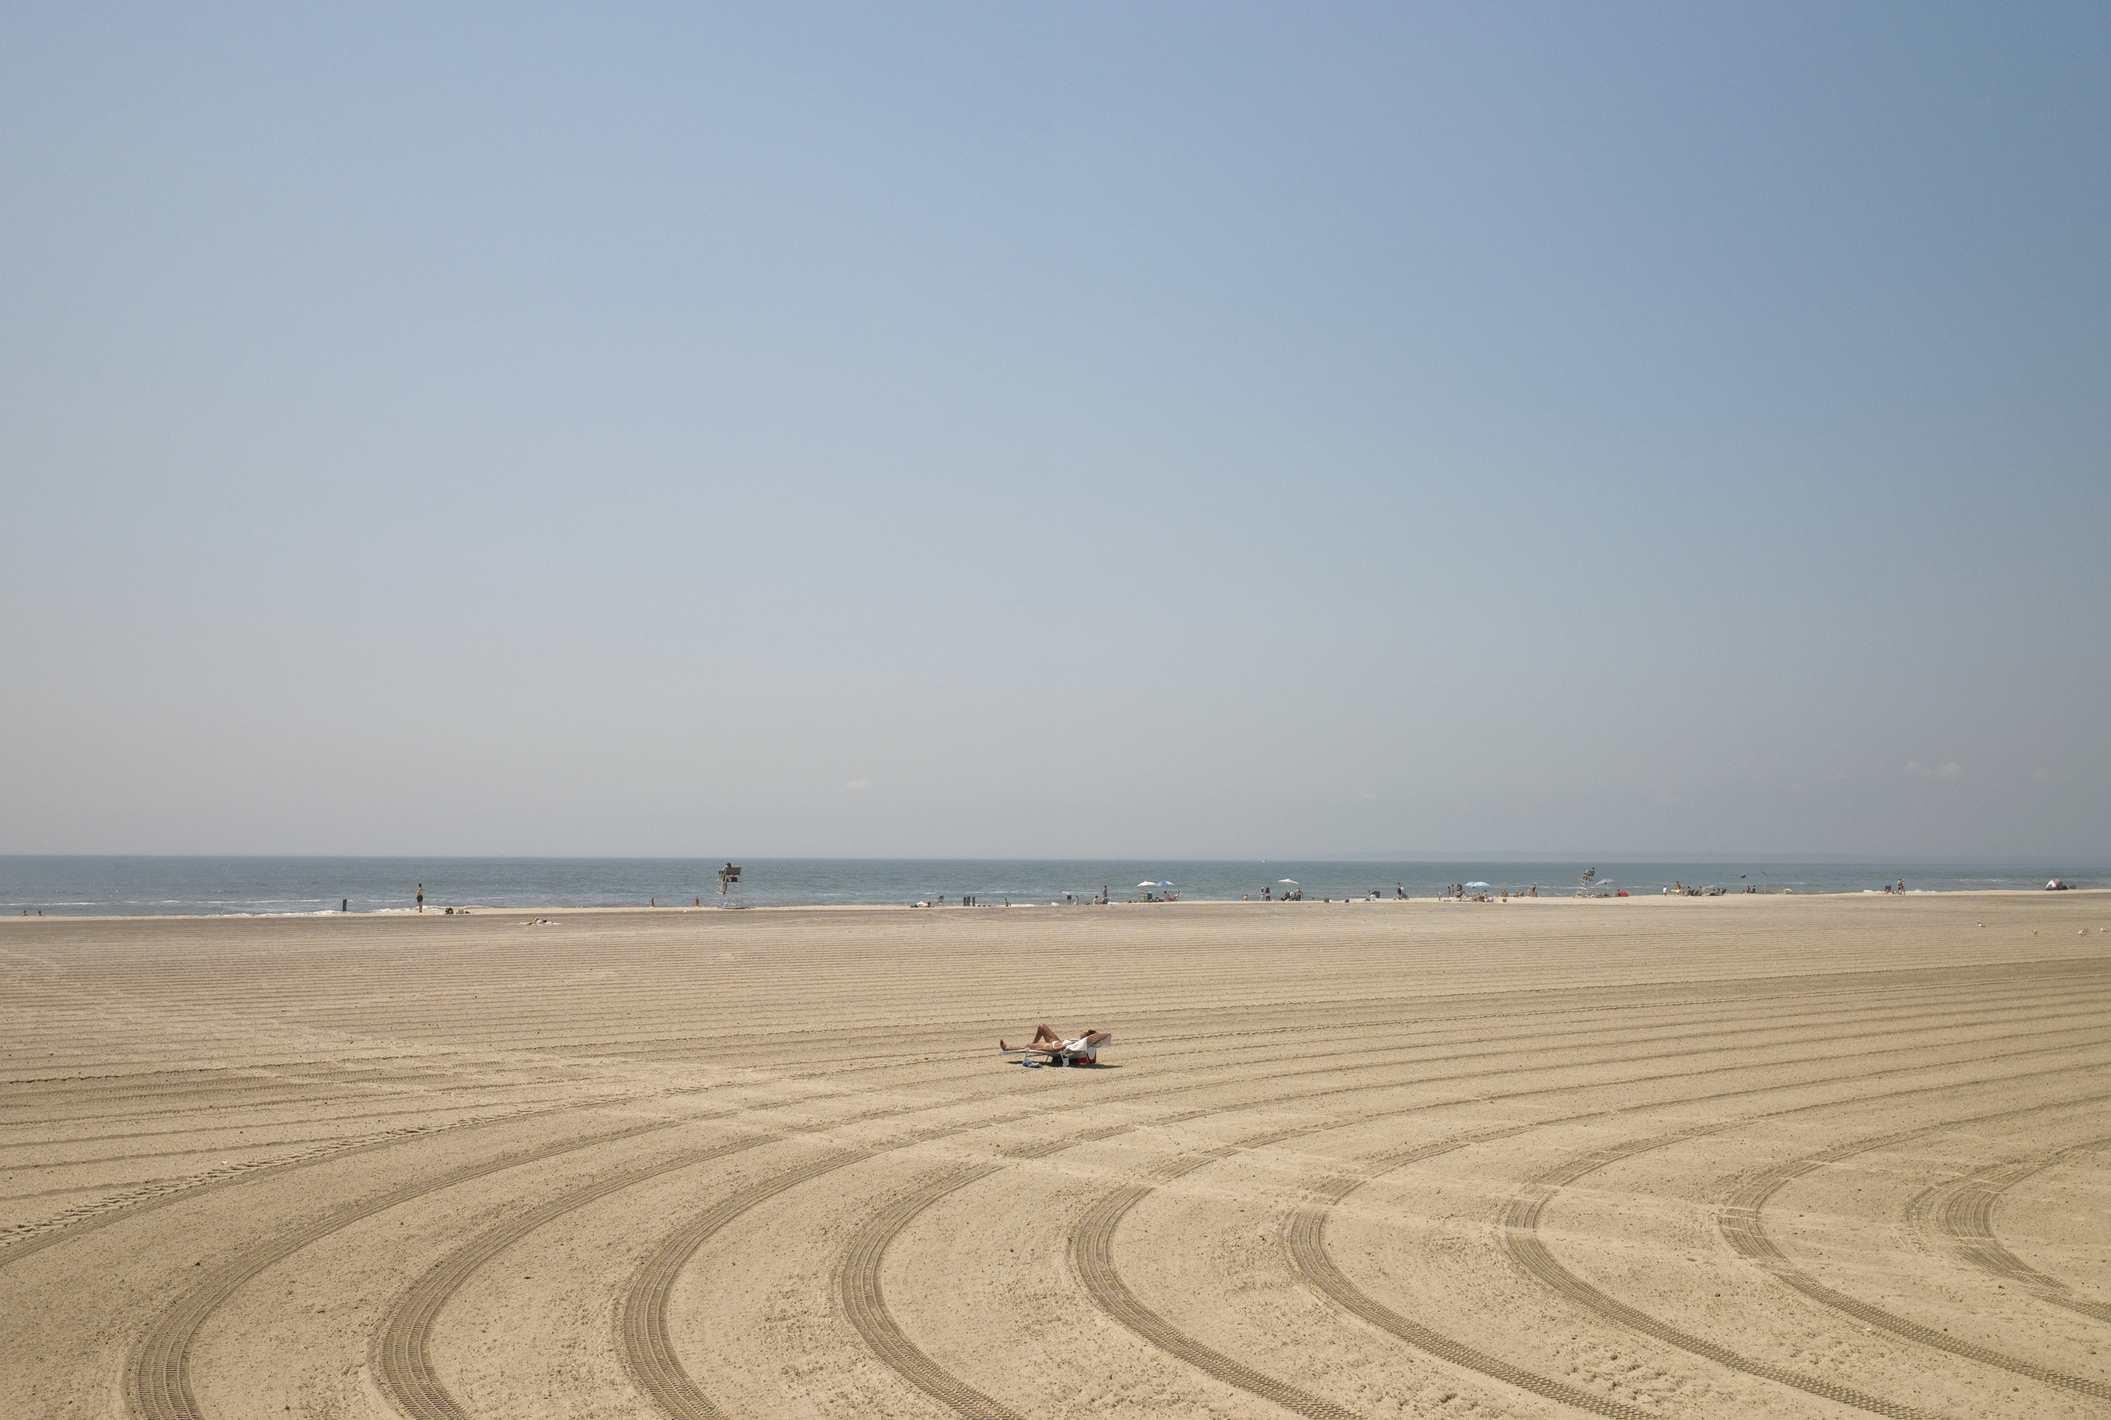 Tyre tracks on beach